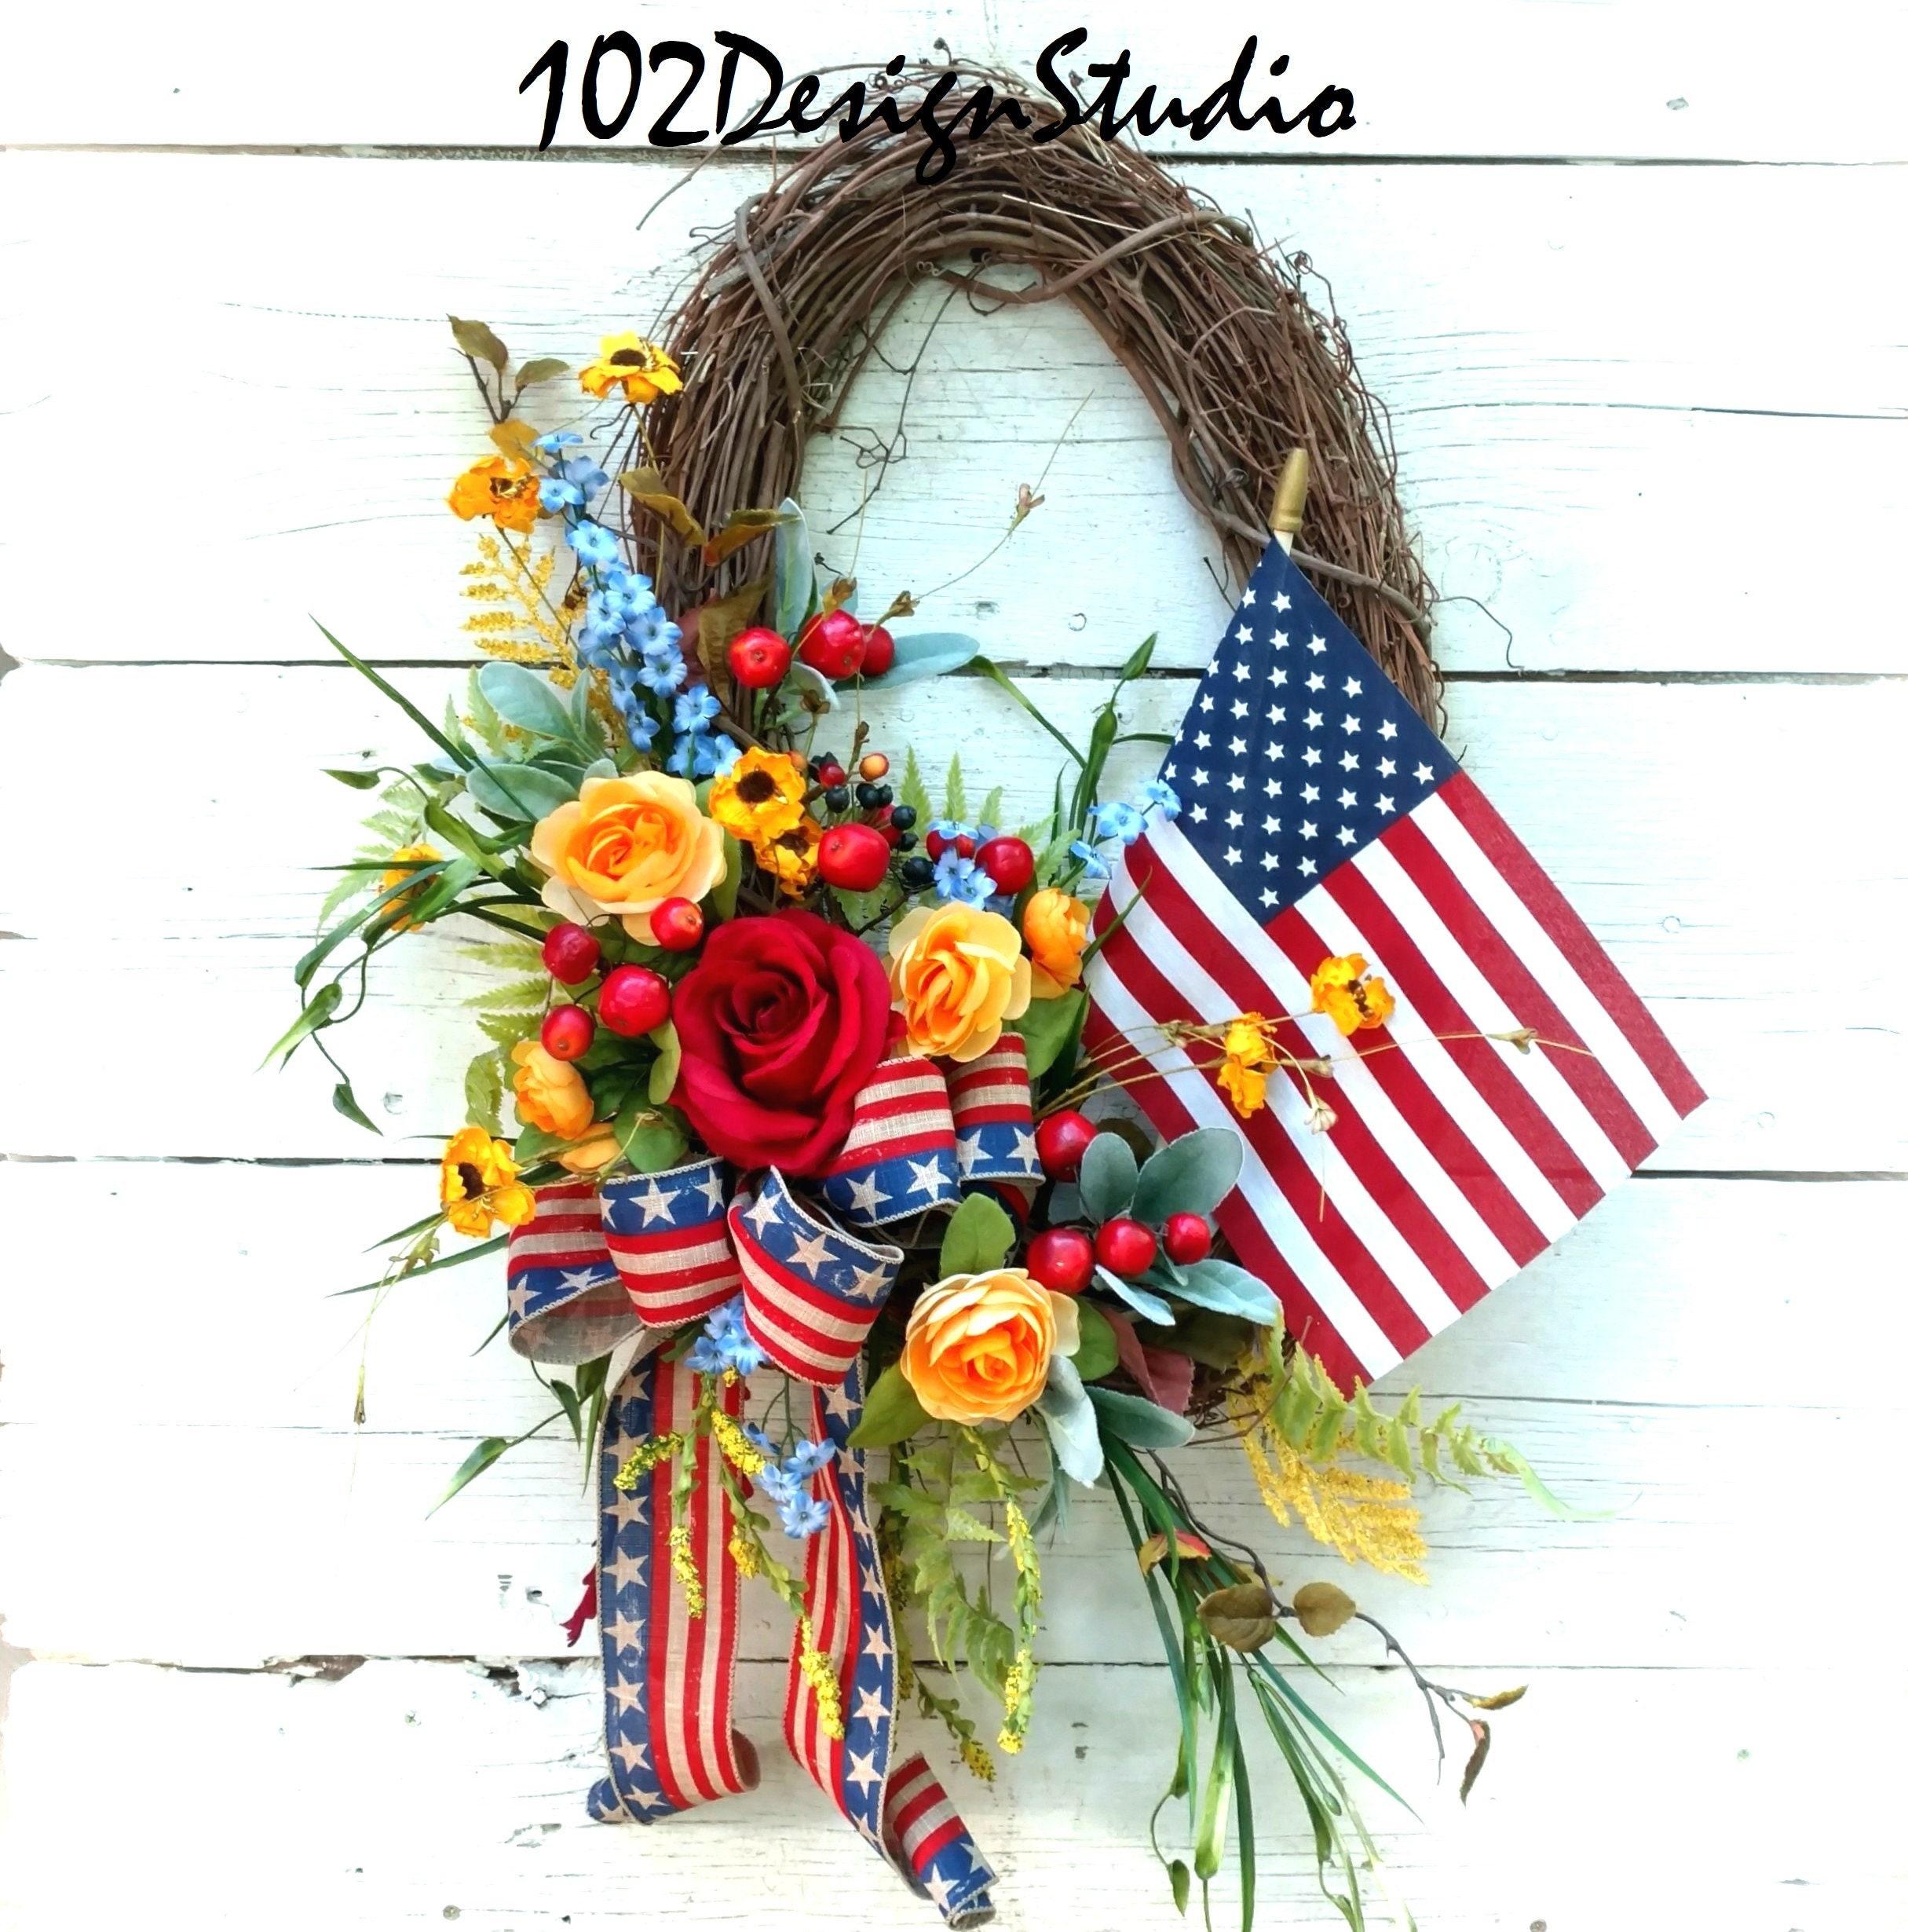 Patriotic Wreathpatriotic Swagmilitary Wreathmilitary Swag